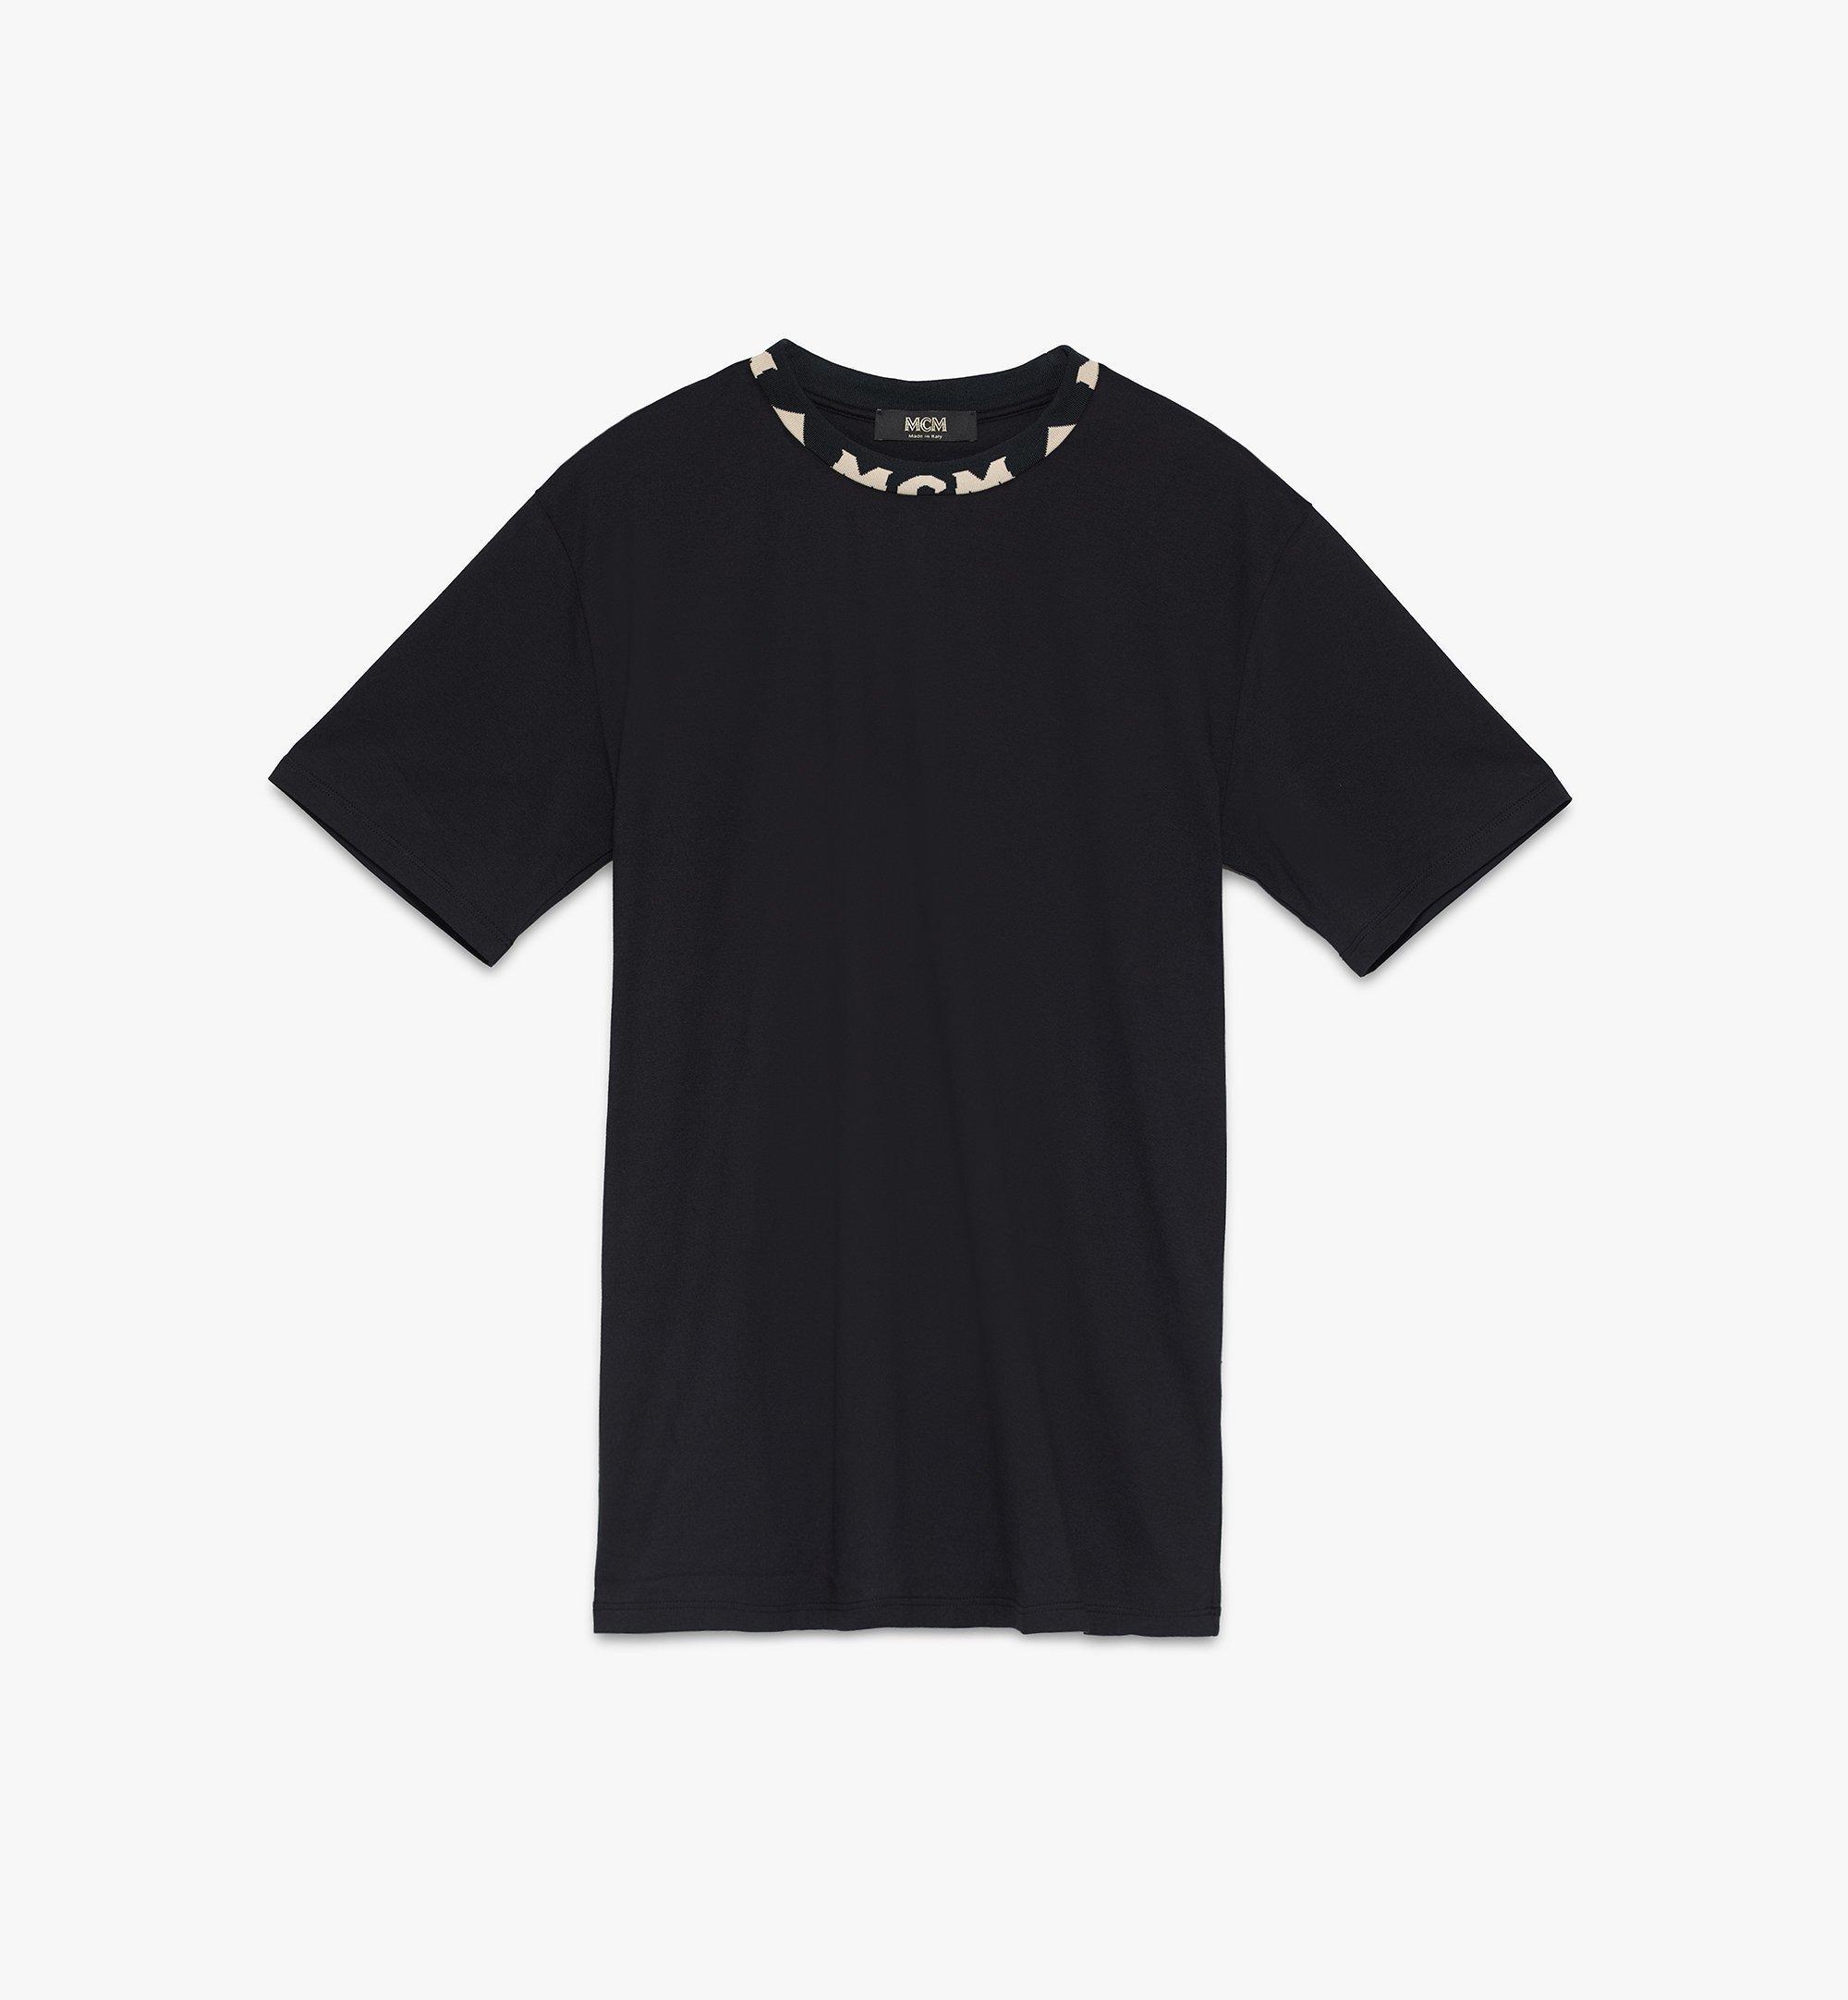 MCM メンズ ロゴトリム Tシャツ Black MHTASMM03BT00L Alternate View 1